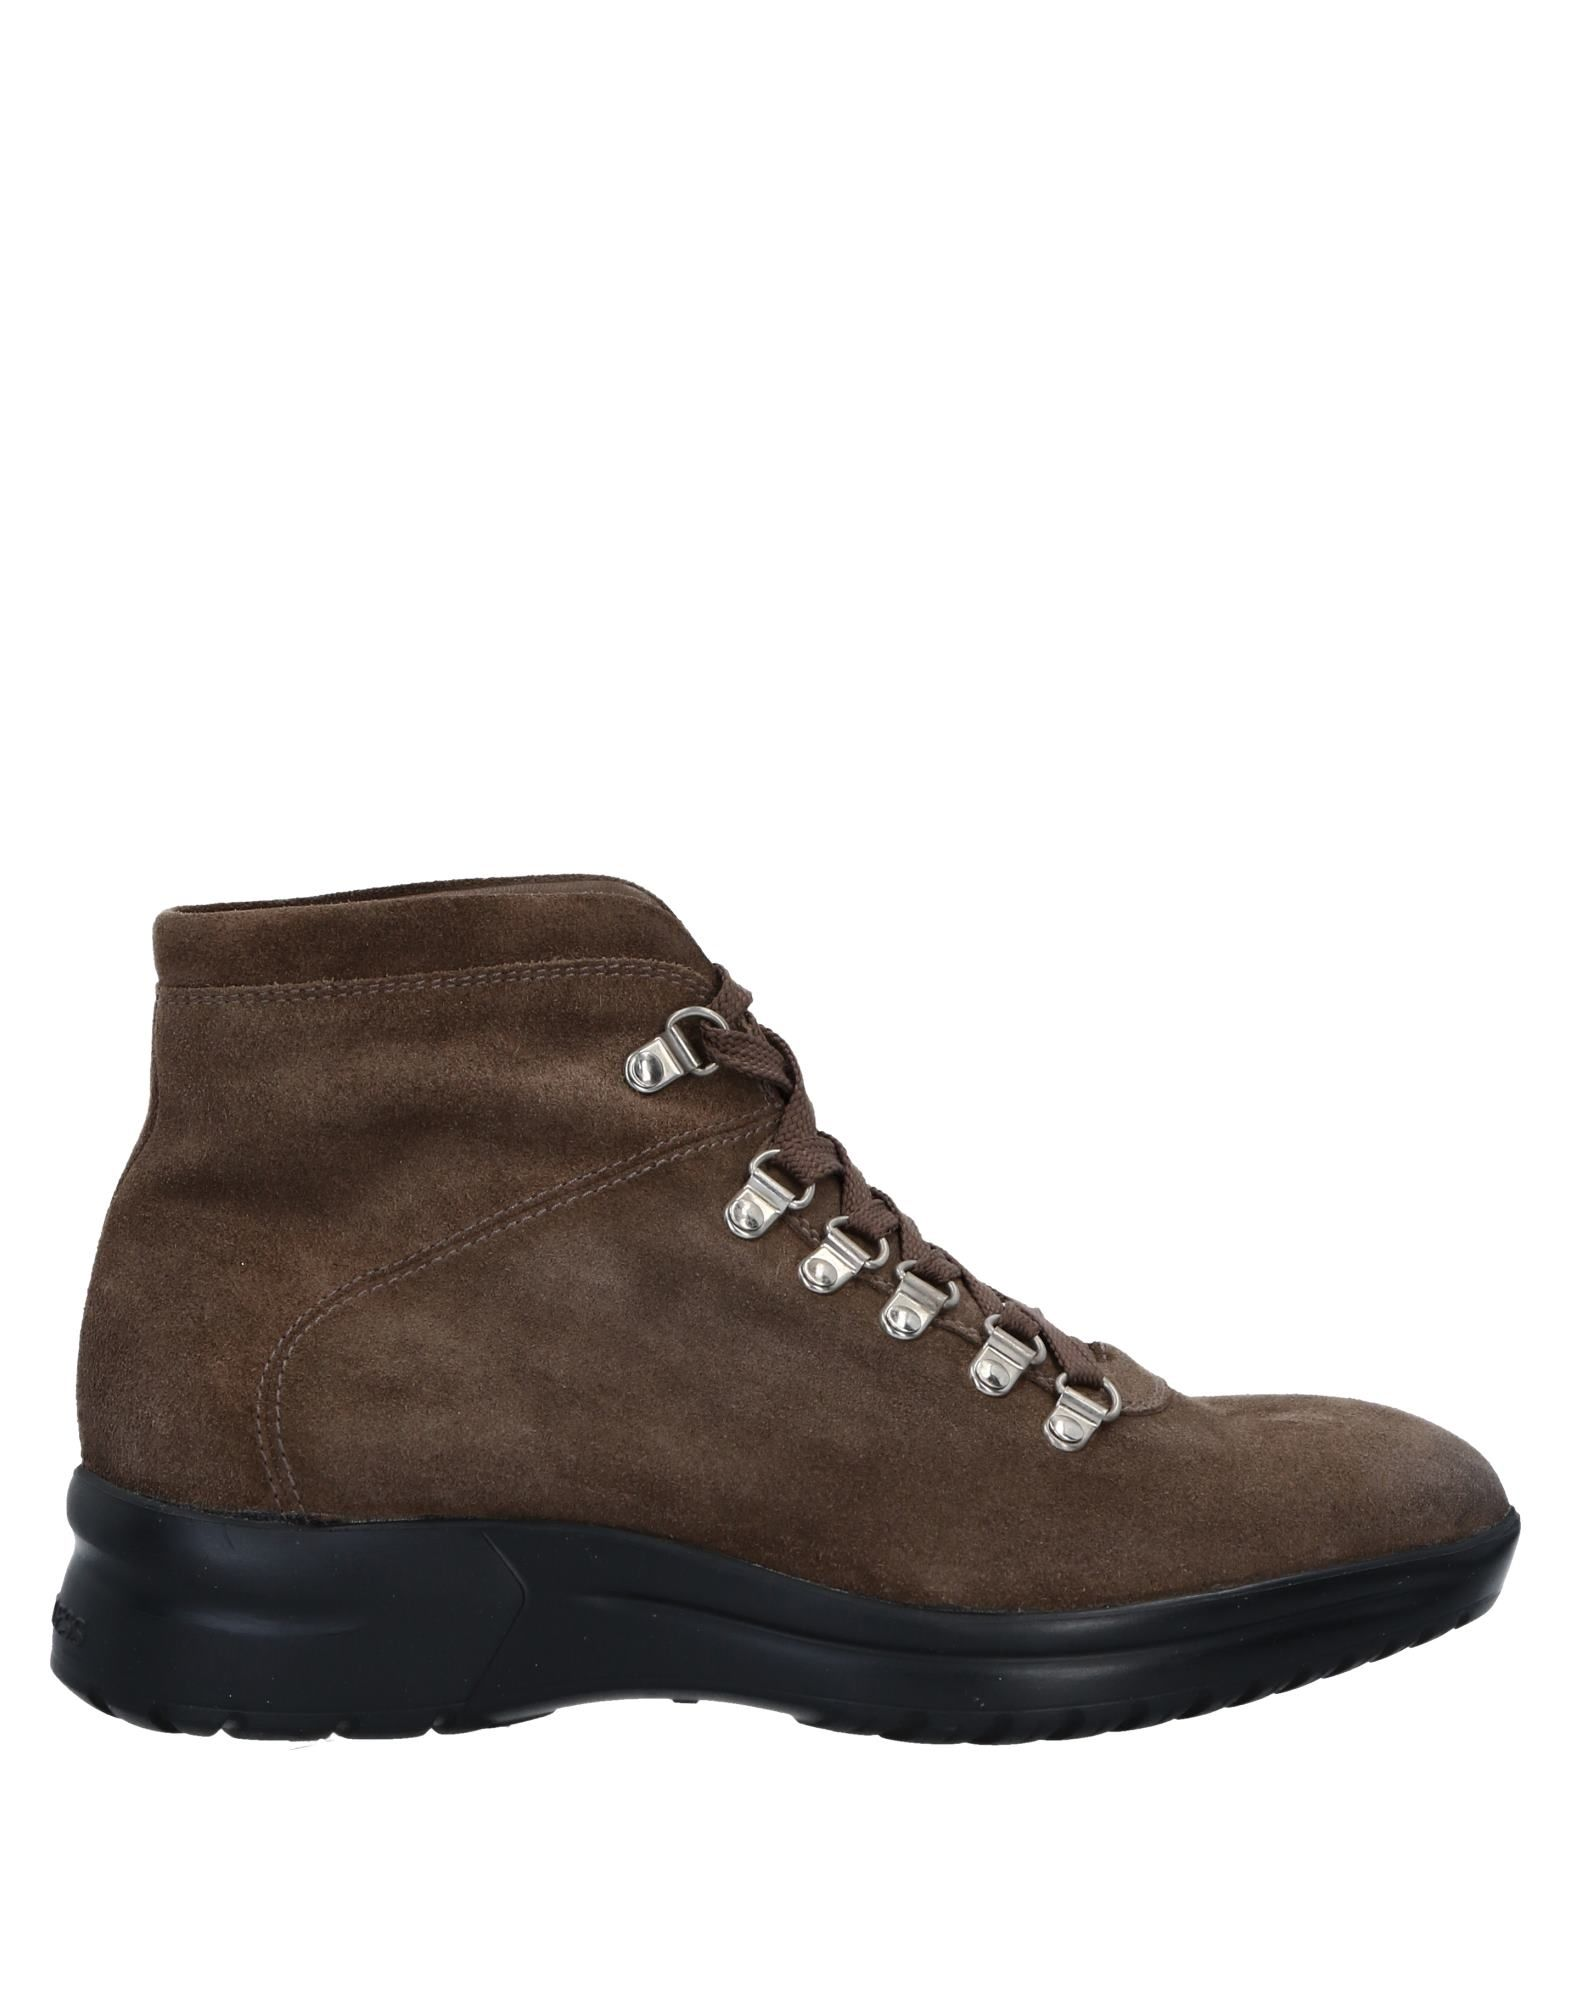 BRIAN CRESS by CAMPANILE Полусапоги и высокие ботинки brian atwood полусапоги и высокие ботинки